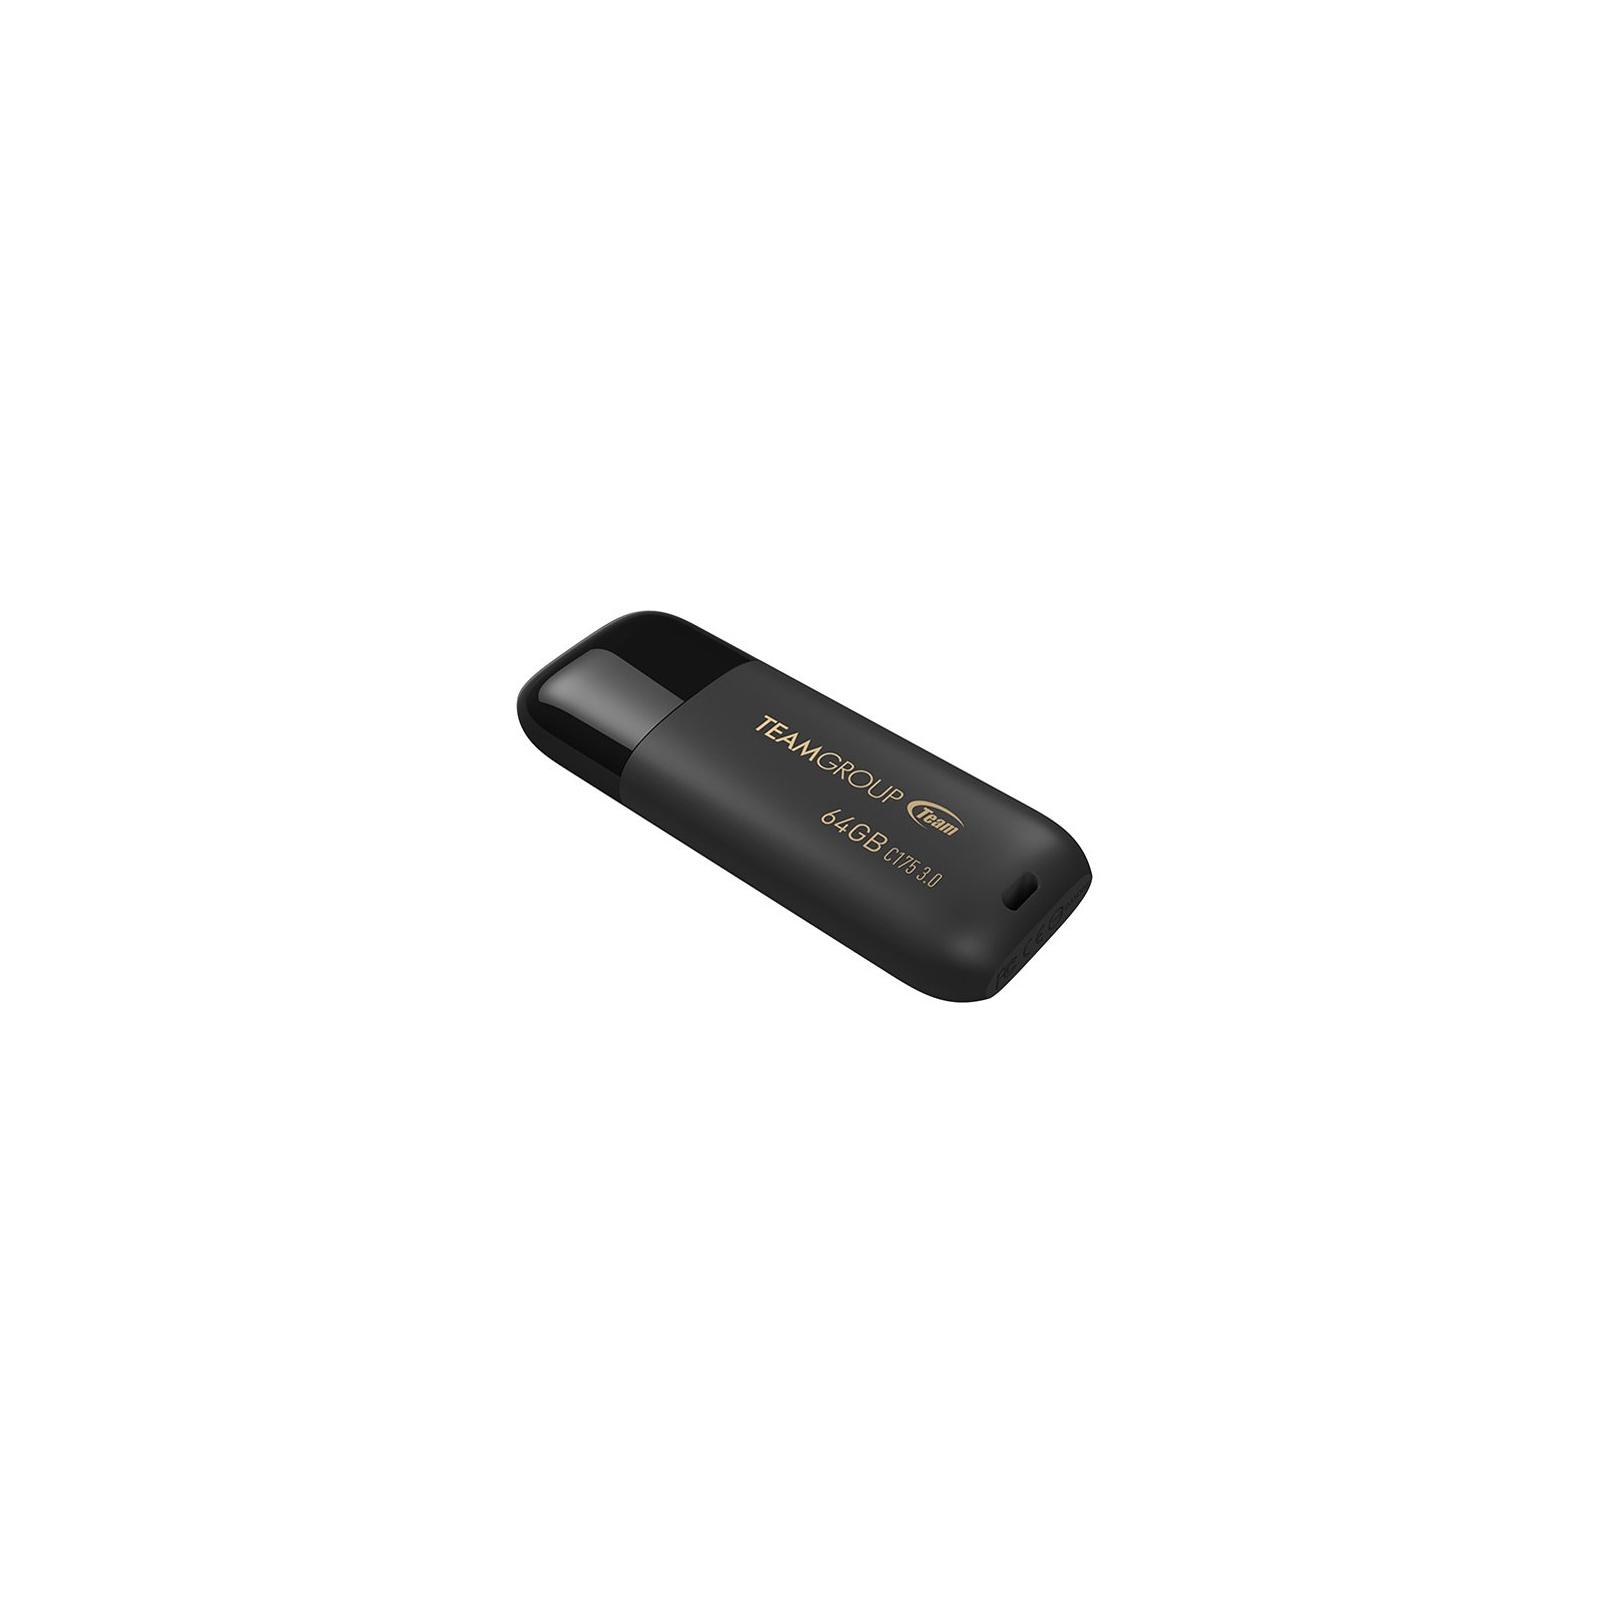 USB флеш накопитель Team 16GB C175 Pearl Black USB 3.1 (TC175316GB01) изображение 3